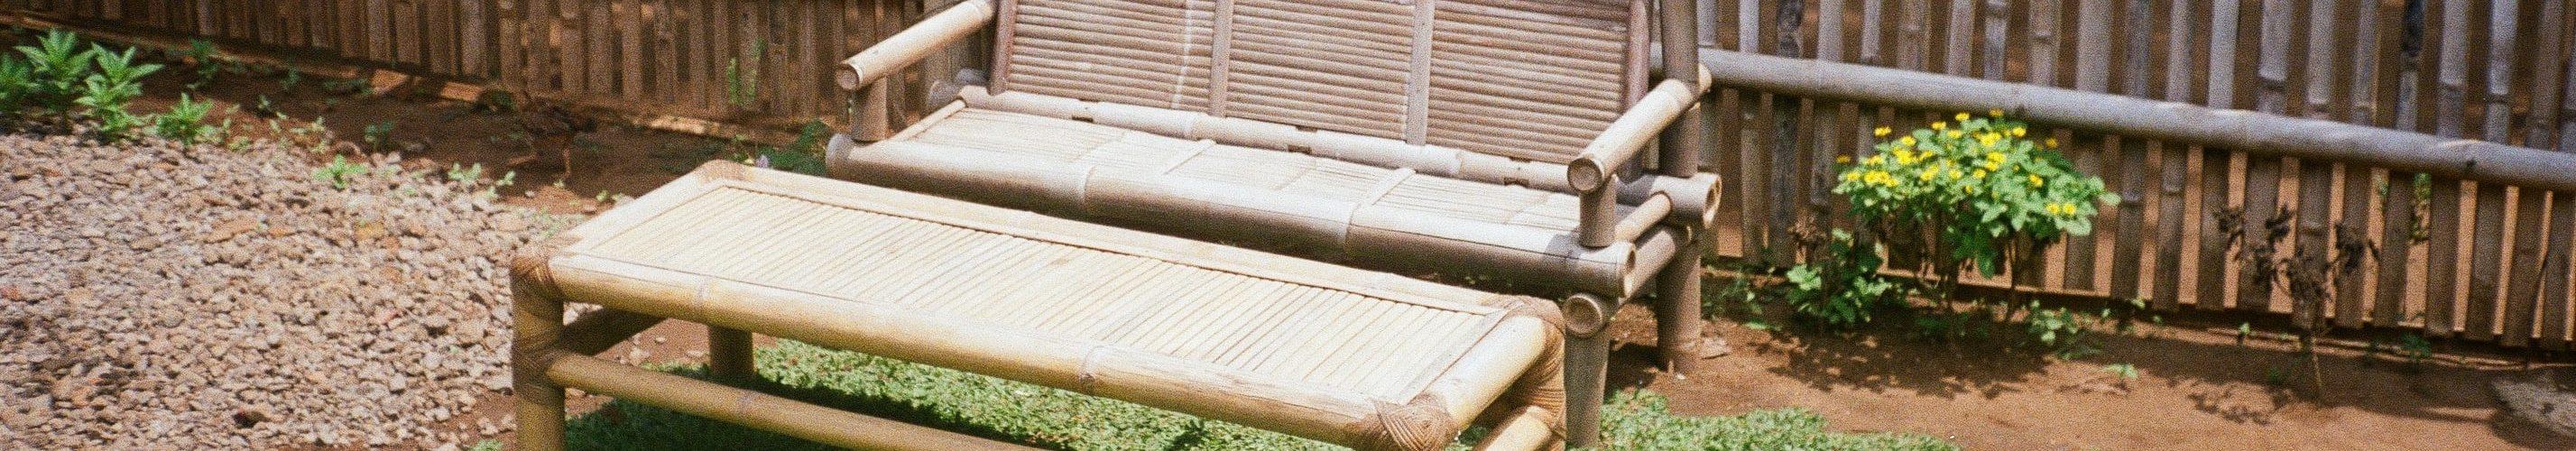 bamboe-tuinmeubelen